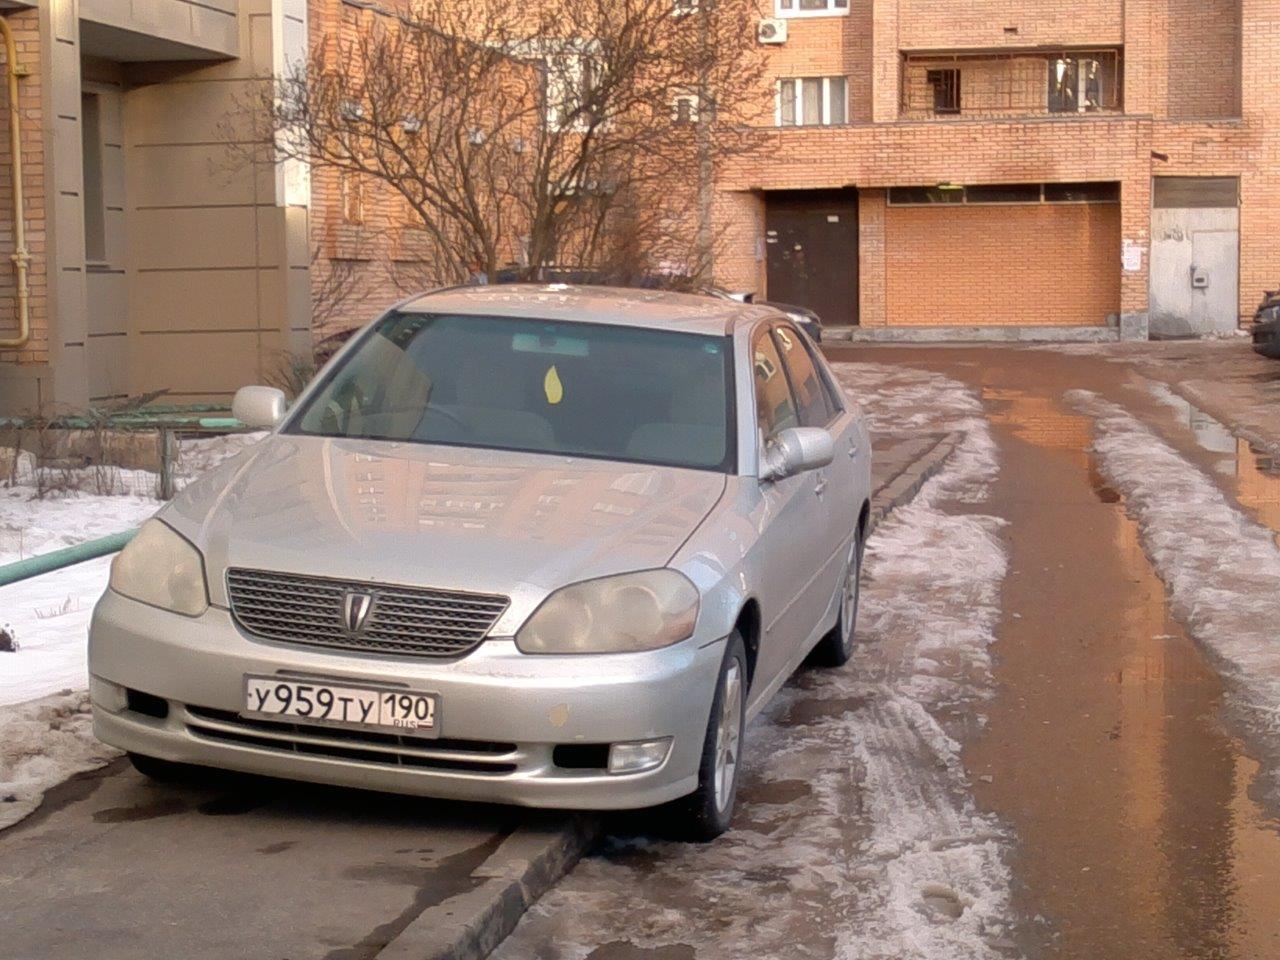 Ситуация с тротуаром у дома №6 по Нахабинскому шоссе